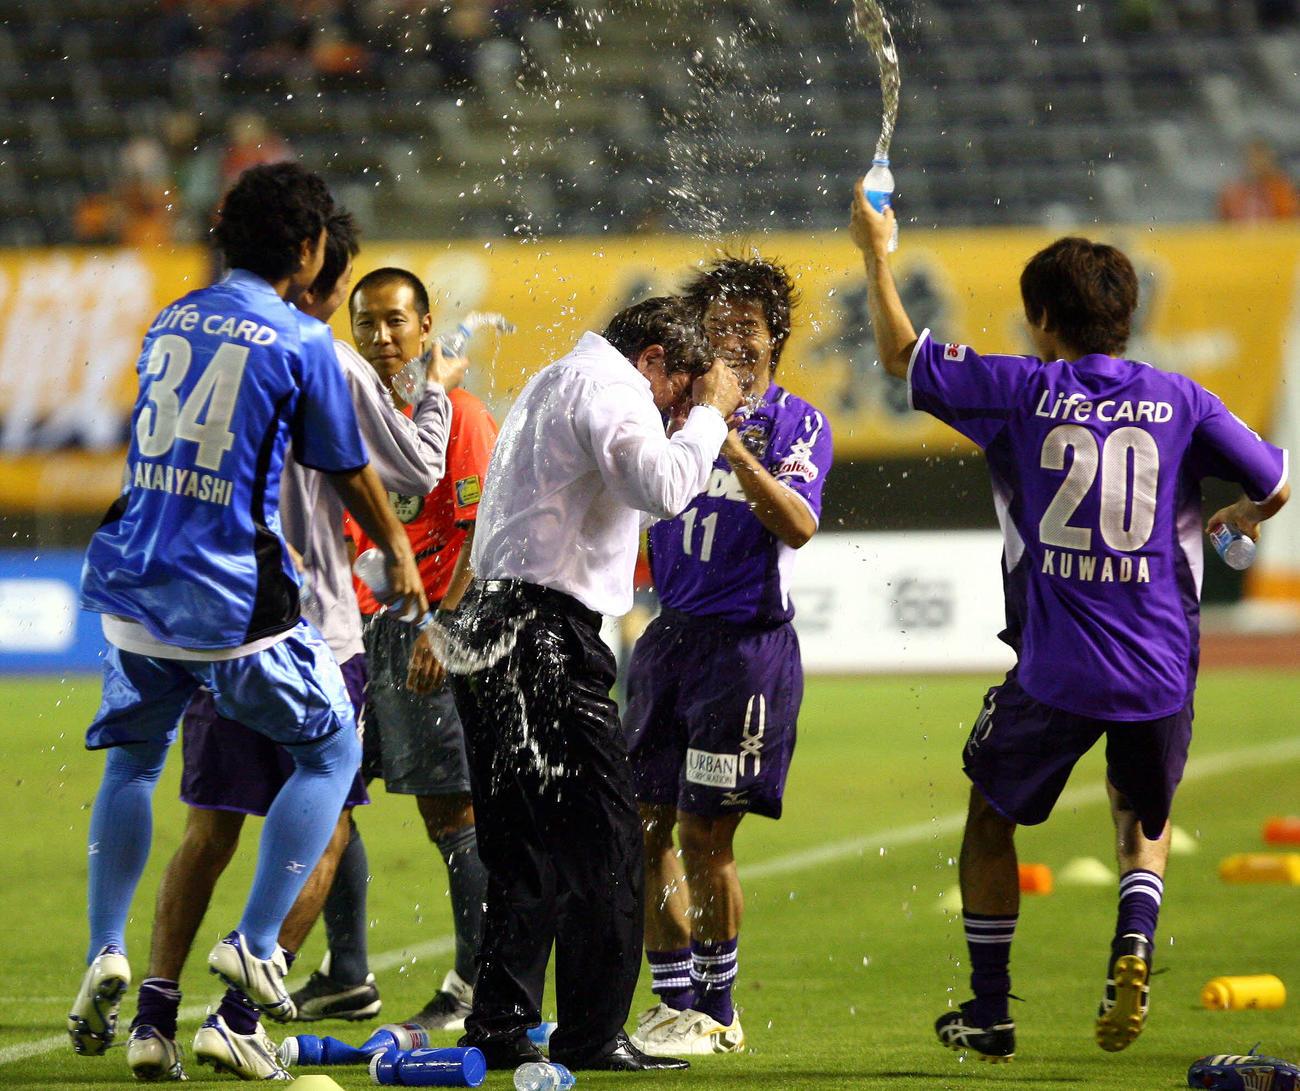 J2広島対愛媛 J1昇格を決めた瞬間、佐藤寿人(中央)らはペトロビッチ監督らに水シャワーを浴びせて大喜び(2008年9月23日撮影)